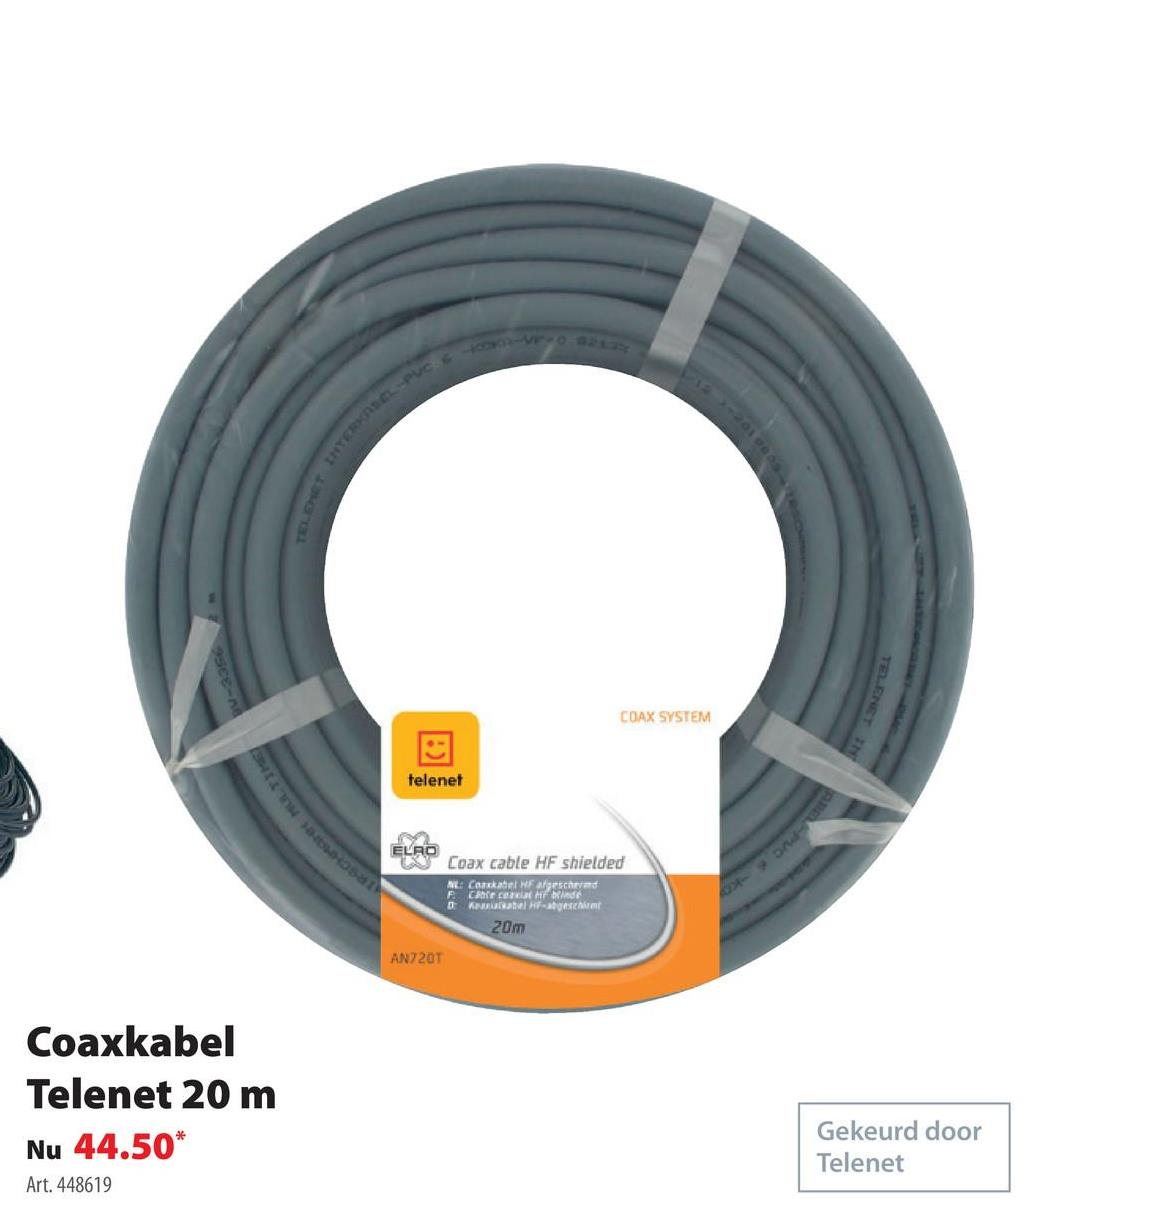 Q-link coaxkabel Telenet grijs - lengte 20 m -